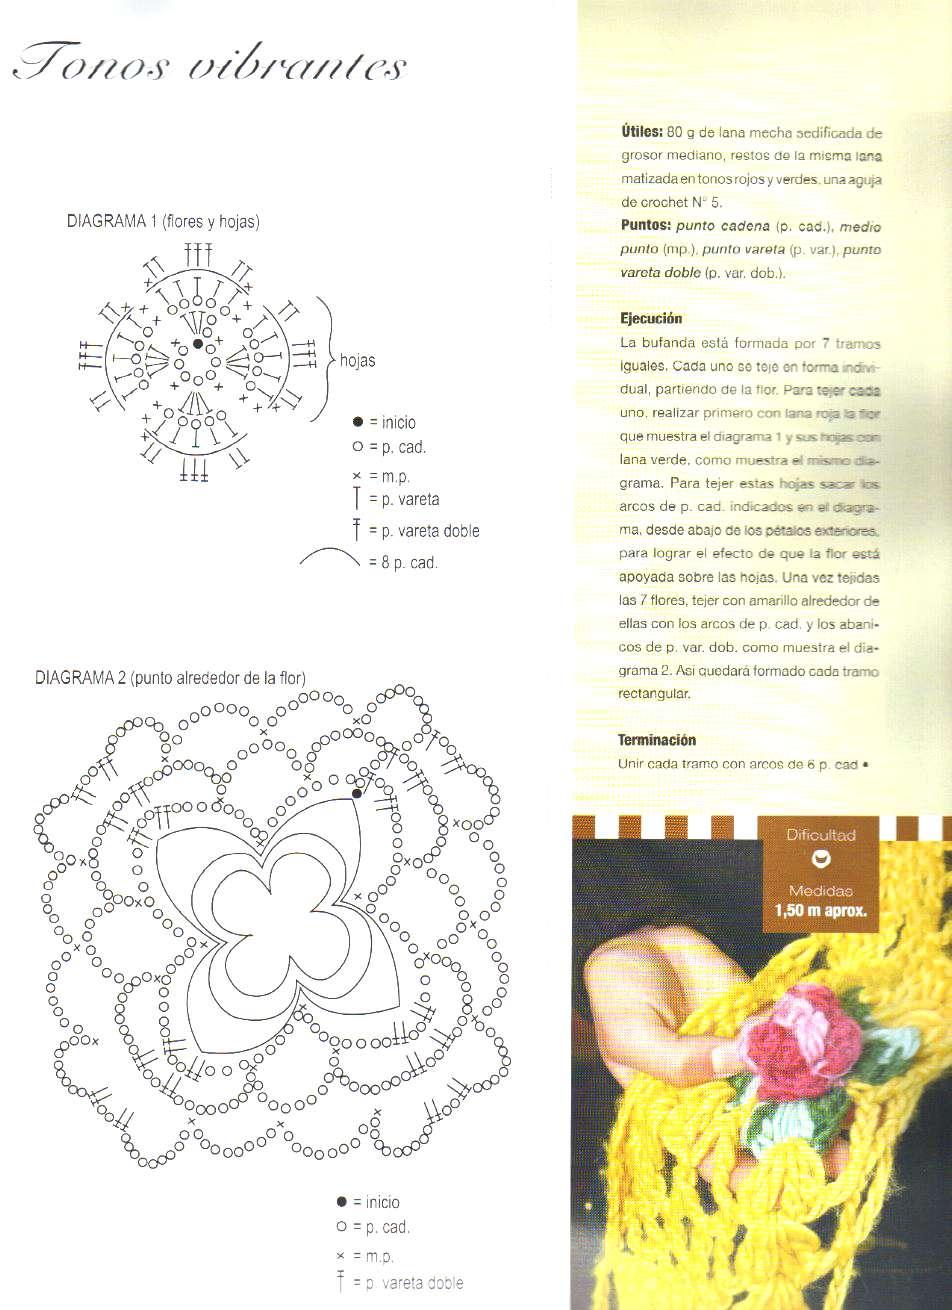 Bufanda caladas con flores en relieve